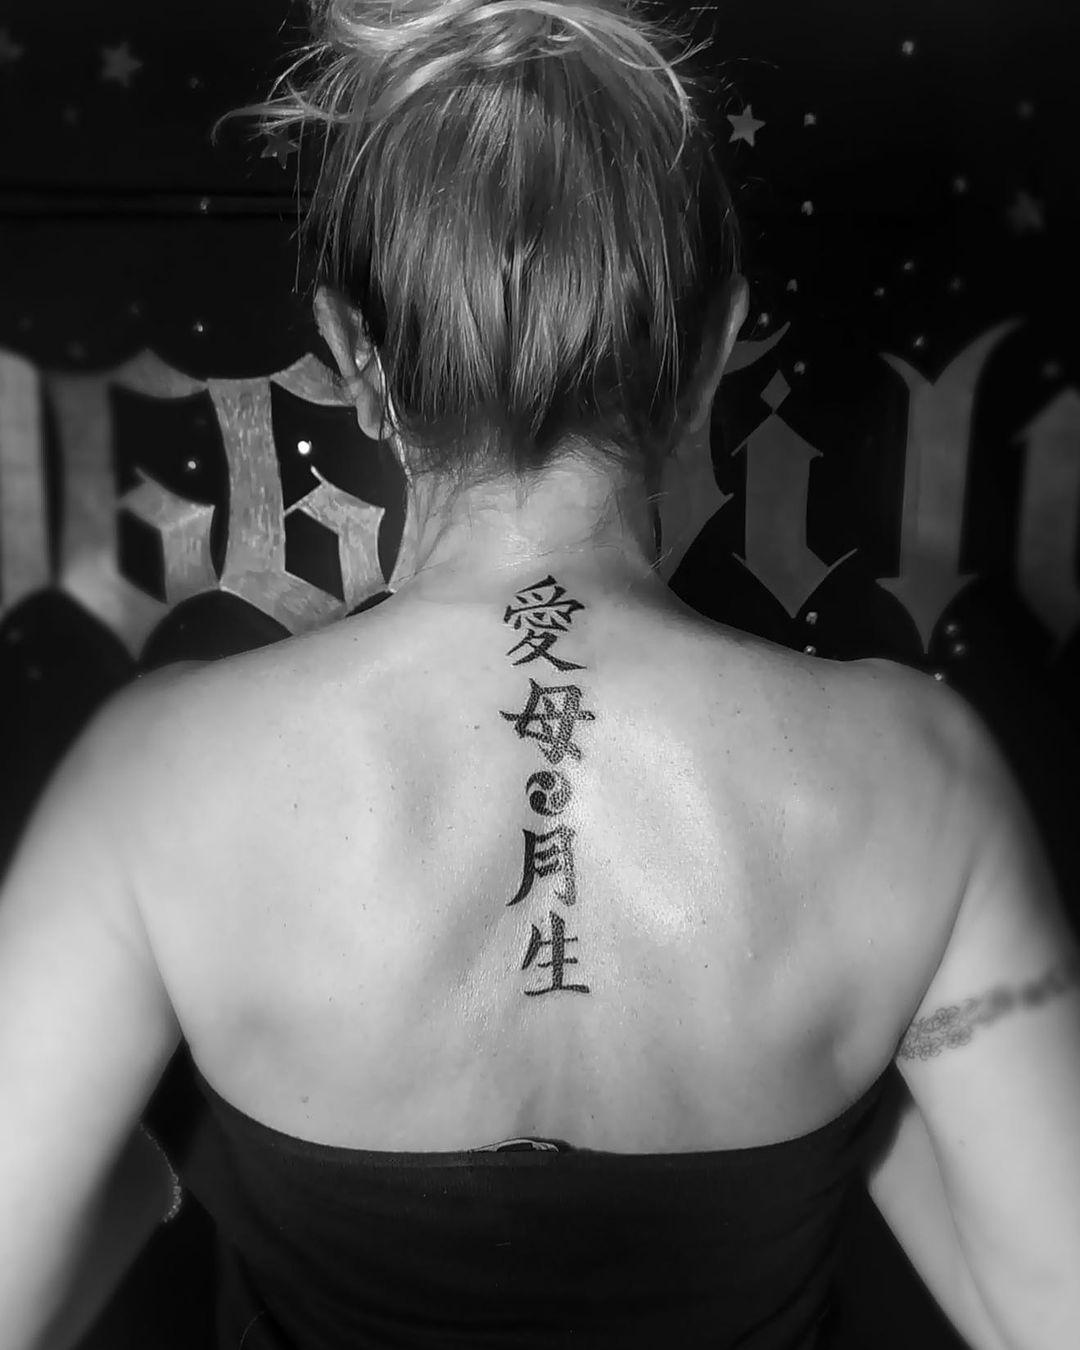 Inspirational image of kanji tattoo